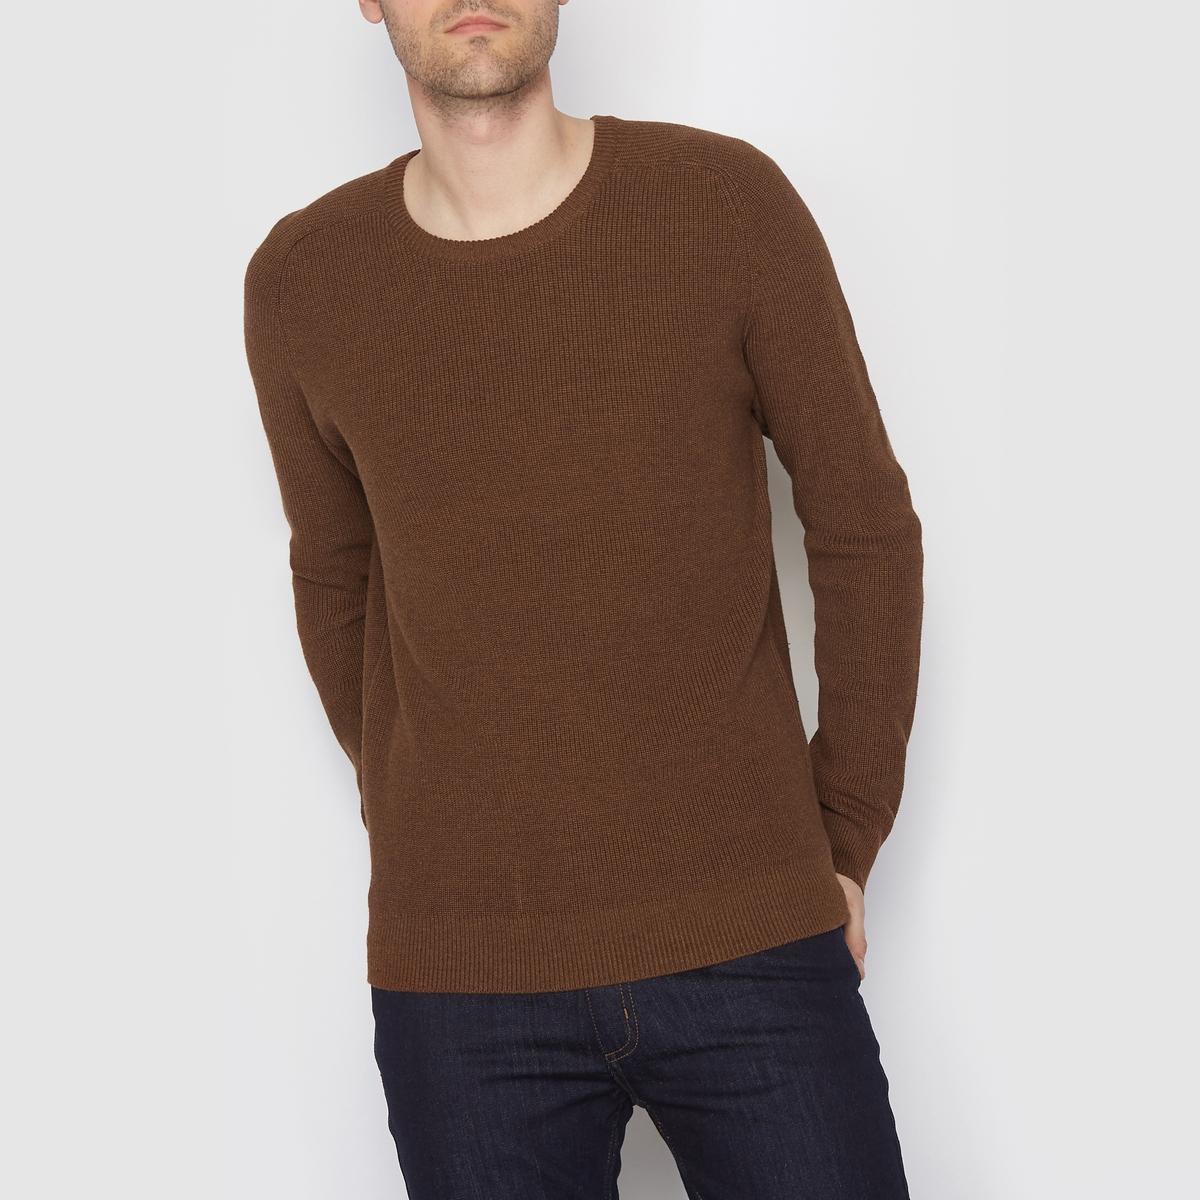 Пуловер из трикотажа мулинеСостав и описание:Материал: 100% хлопка.Длина: 67 см.Марка: R edition<br><br>Цвет: темно-бежевый меланж,темно-синий<br>Размер: L.XXL